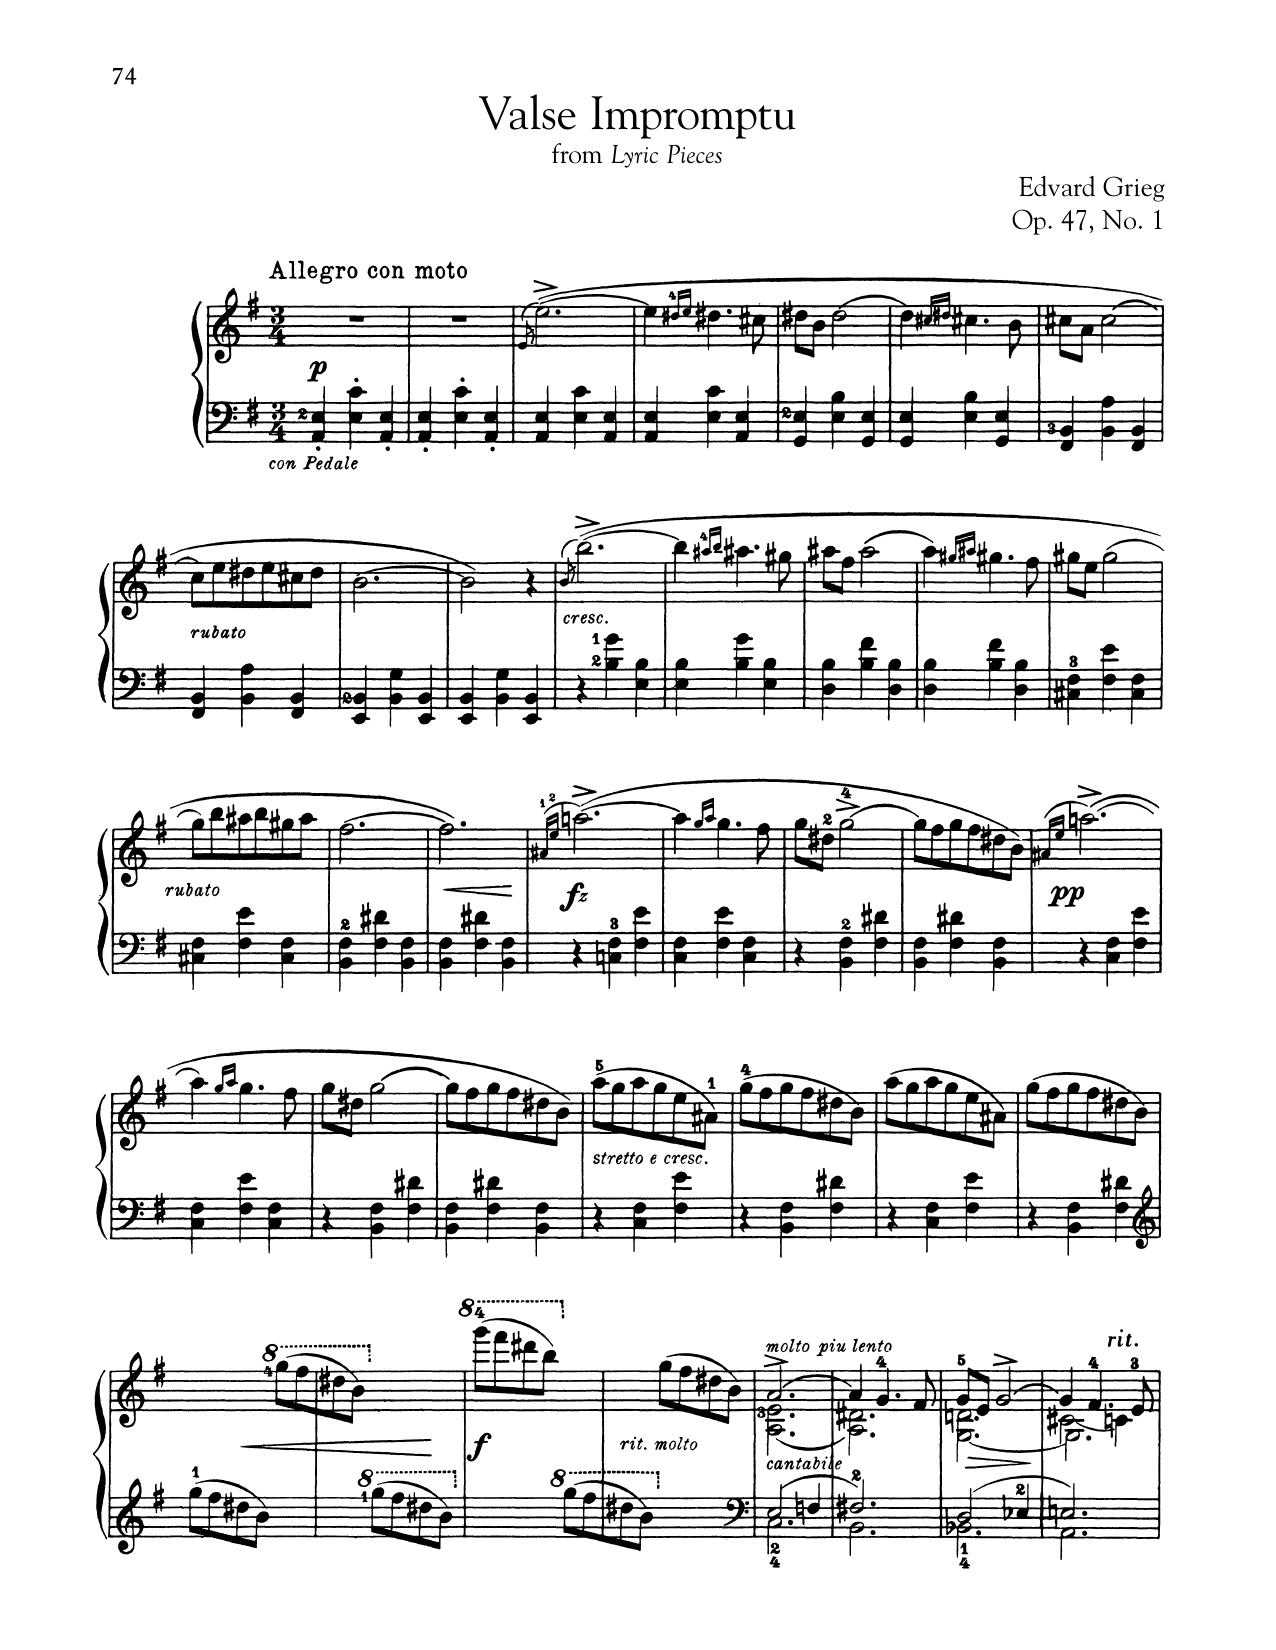 Edvard Grieg Valse Impromptu, Op. 47, No. 1 sheet music notes and chords. Download Printable PDF.